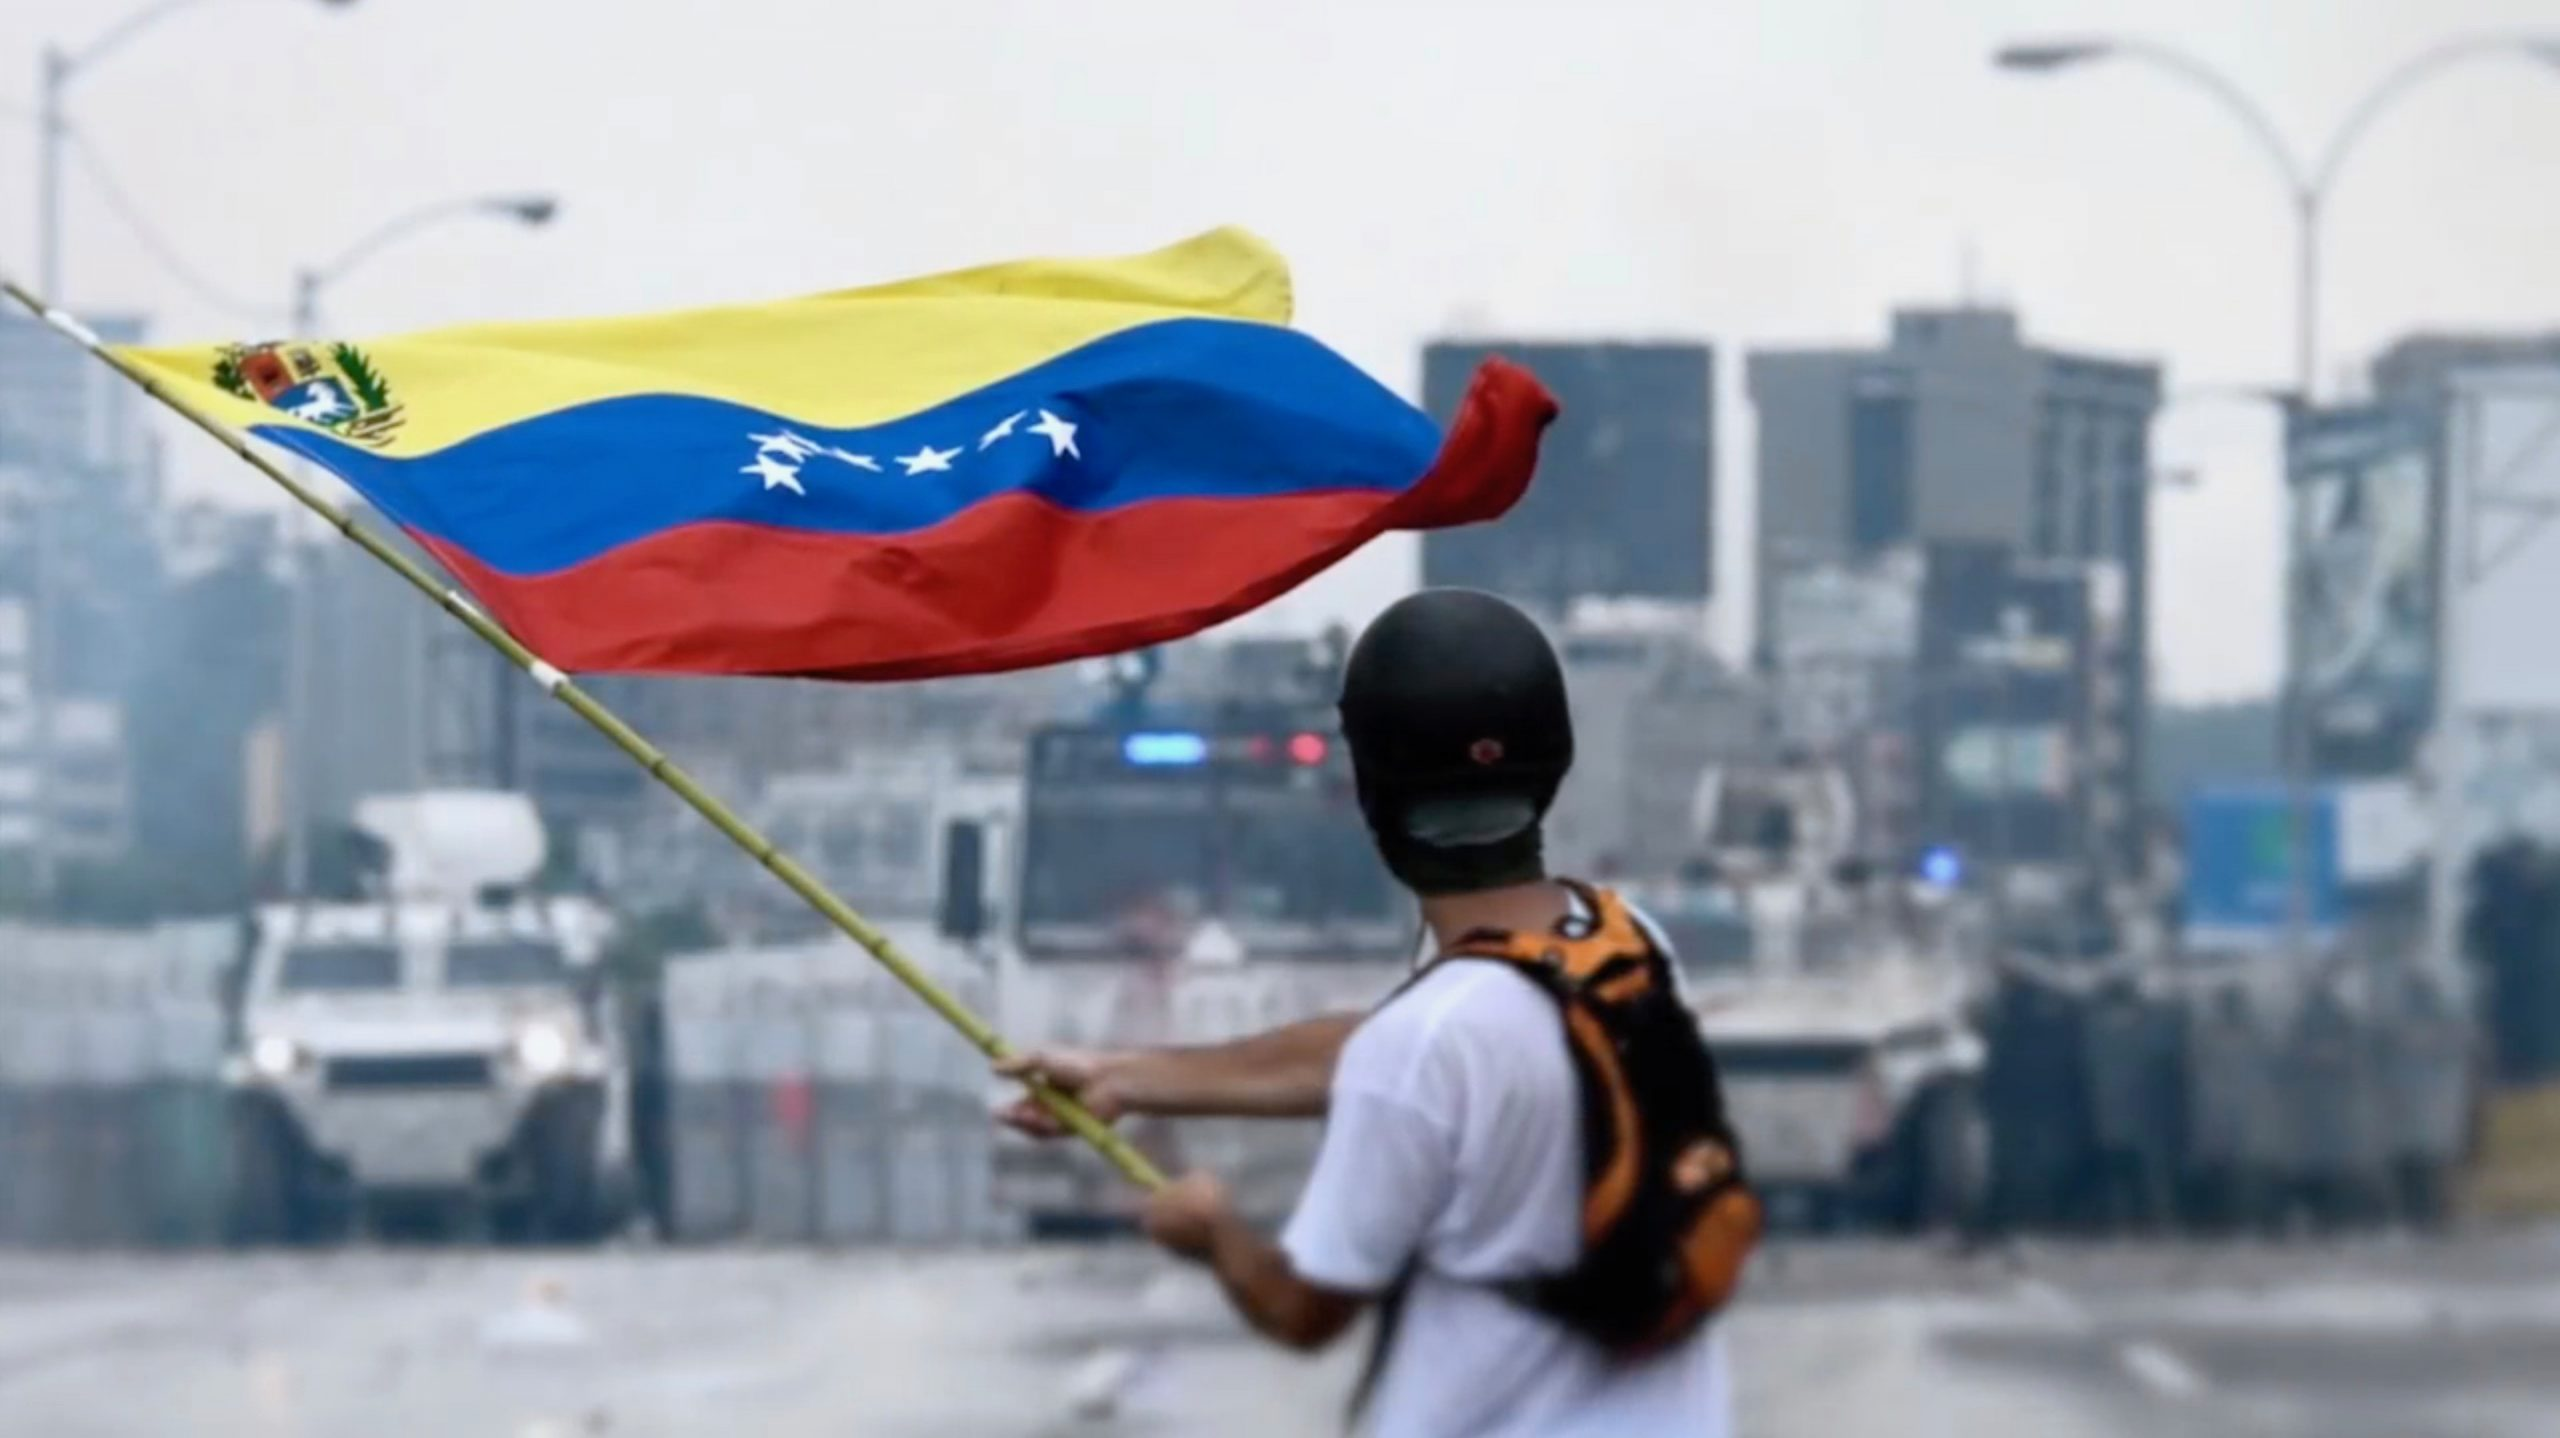 Protestor waiving a venezuelan flag